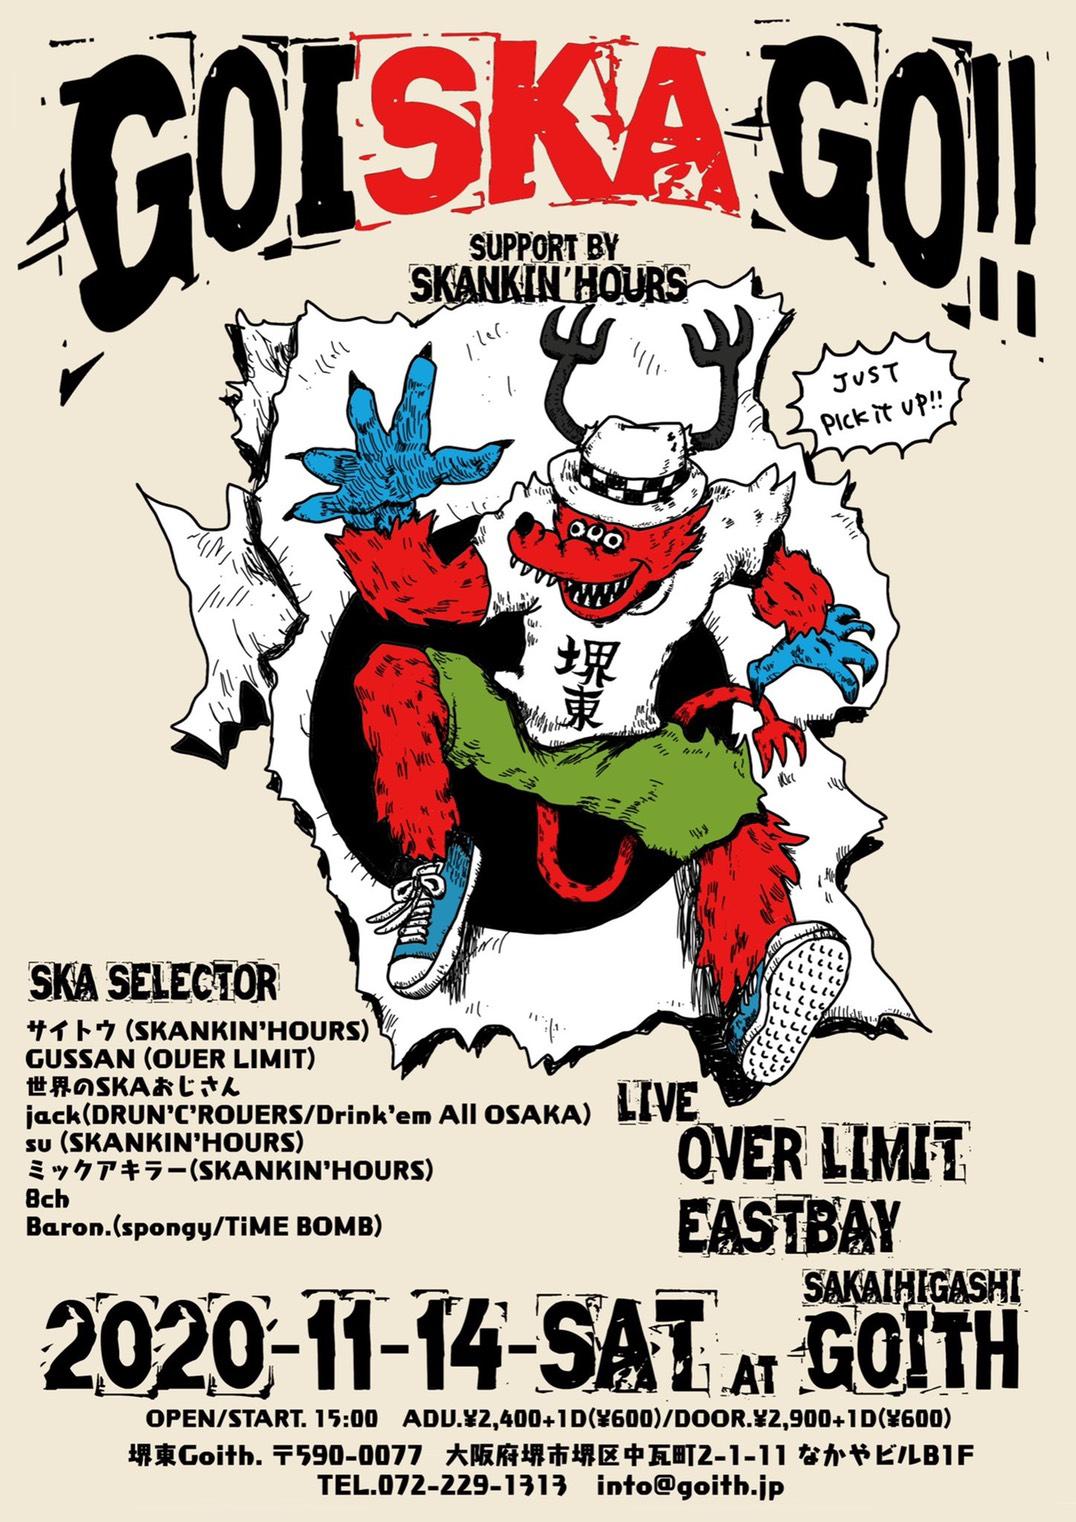 GOISKA GO!!EXTRA2020 support by.SKANKIN'HOURSの写真